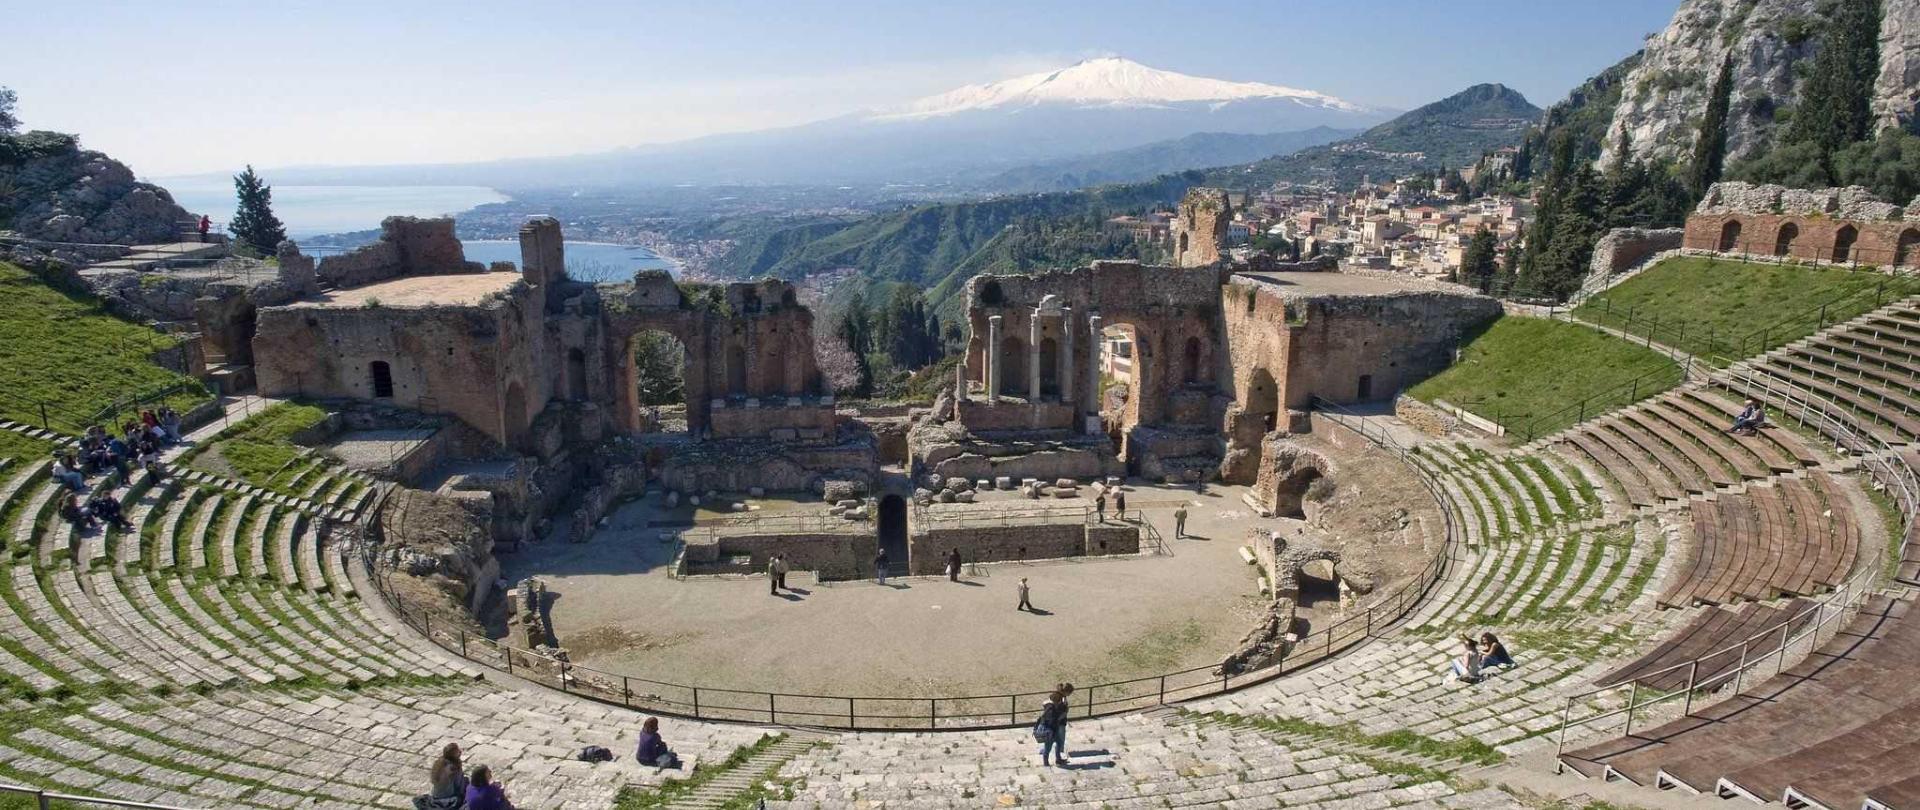 teatro-antico-taormina.jpg